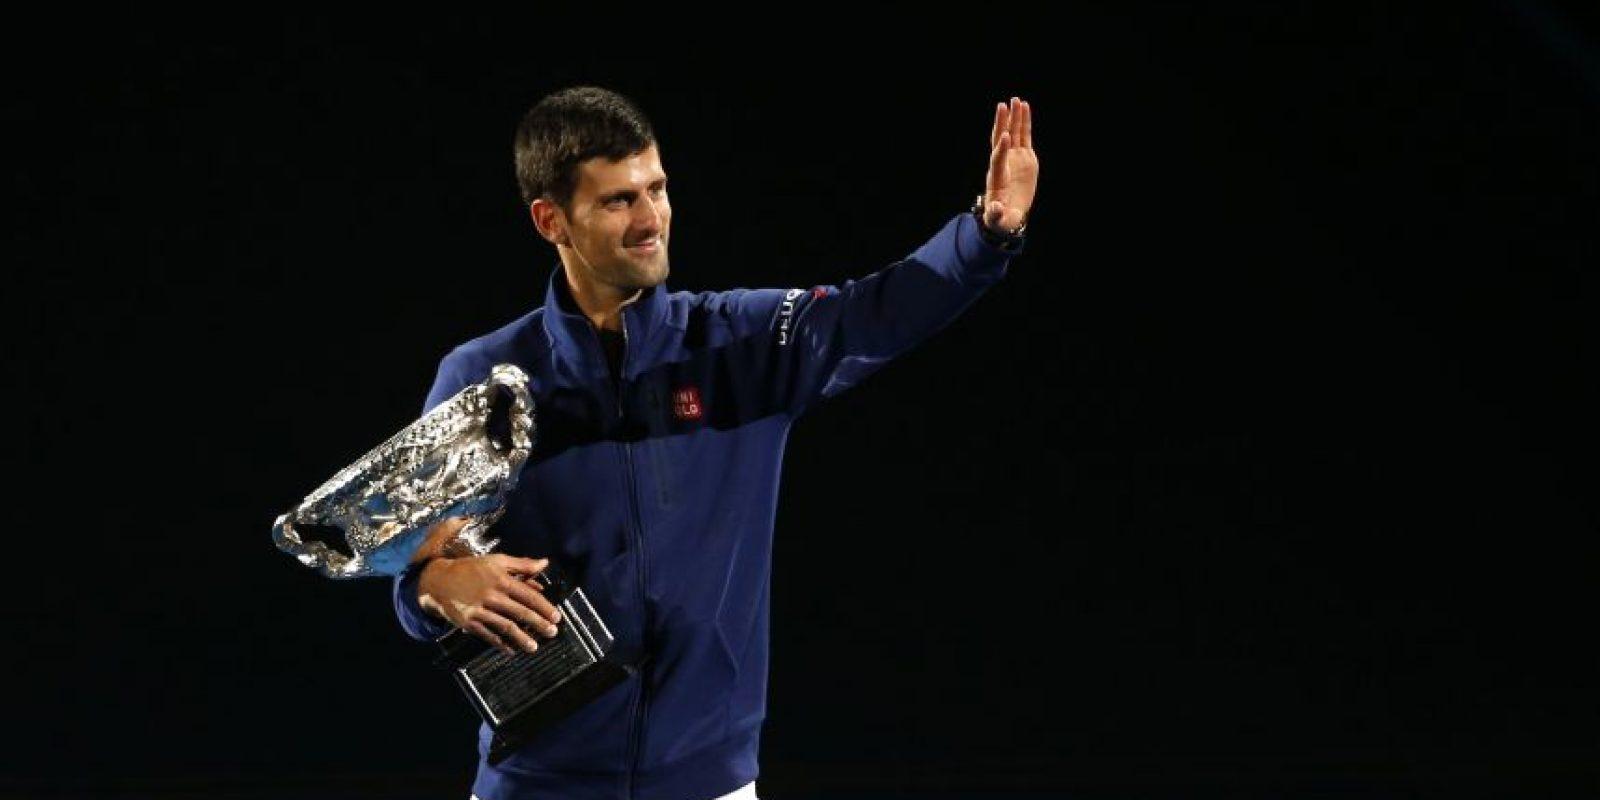 Novak Djokovic, junto a la copa, saluda al público. Foto:AP